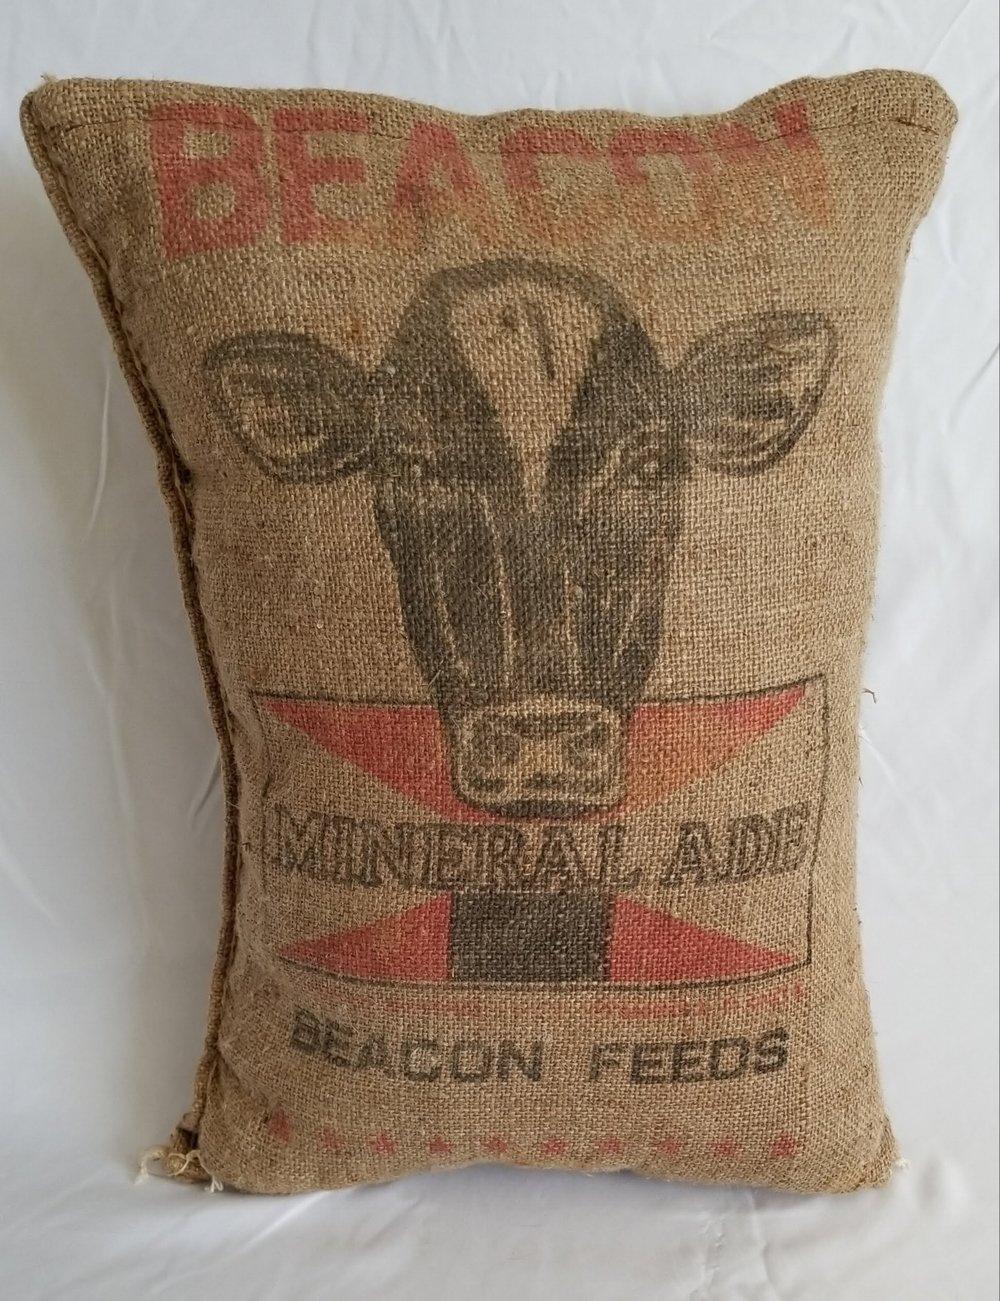 Grain Sack Pillow II